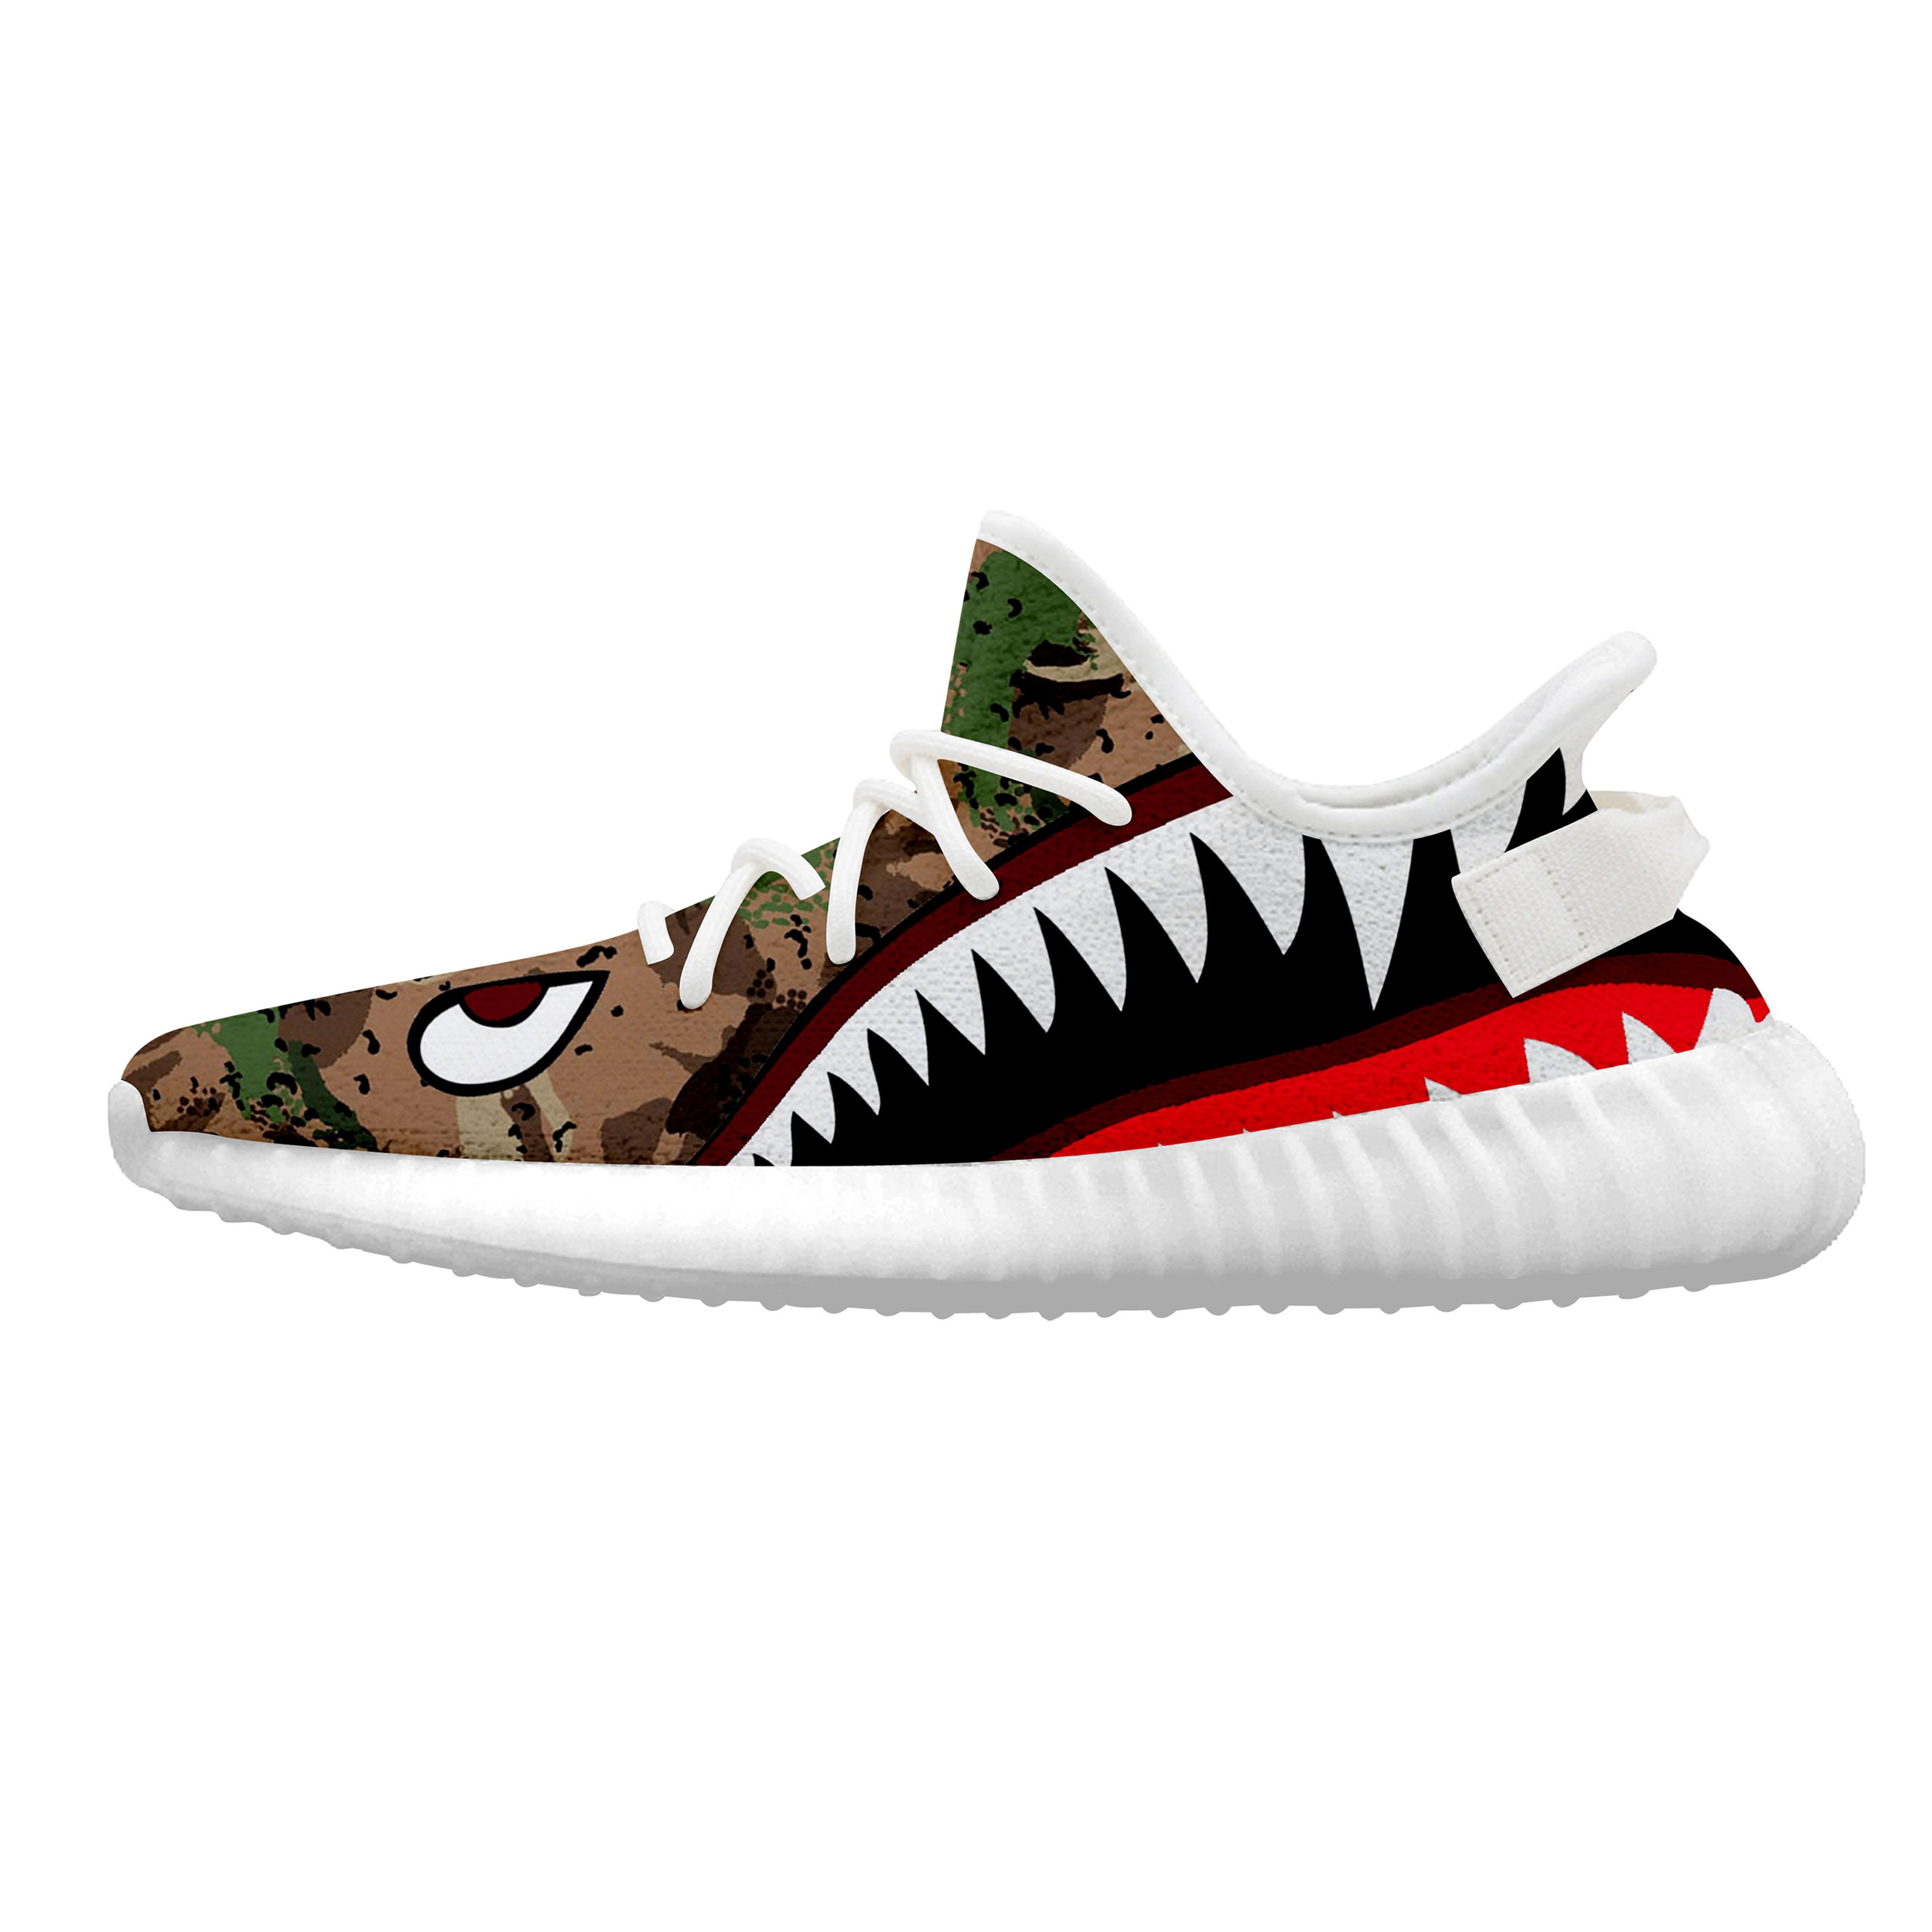 e1245e345 Shark Teeth Beige Military Camouflage Custom Made similar style to ...